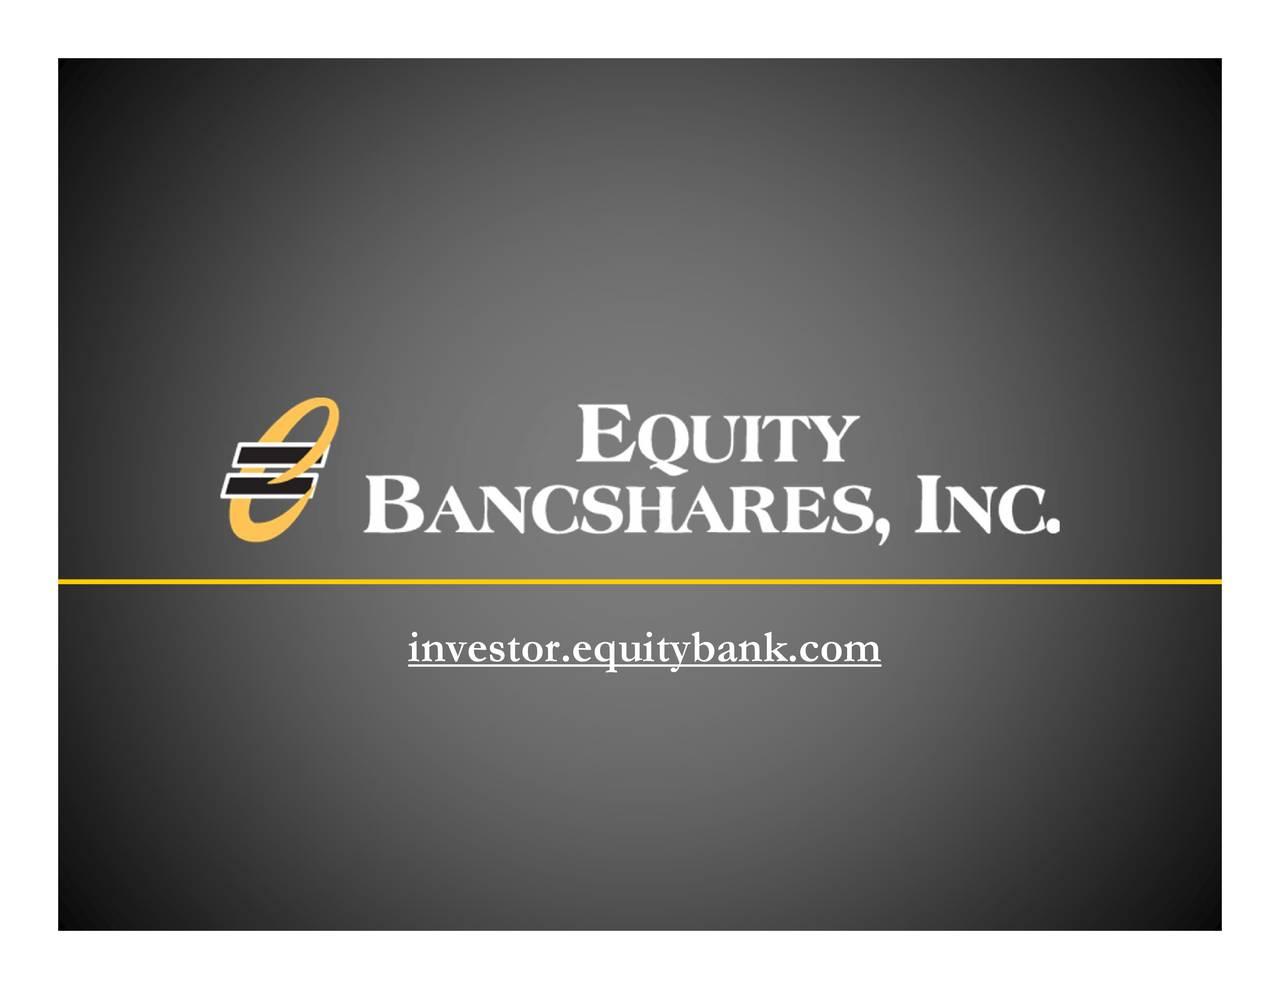 investor.equitybank.com